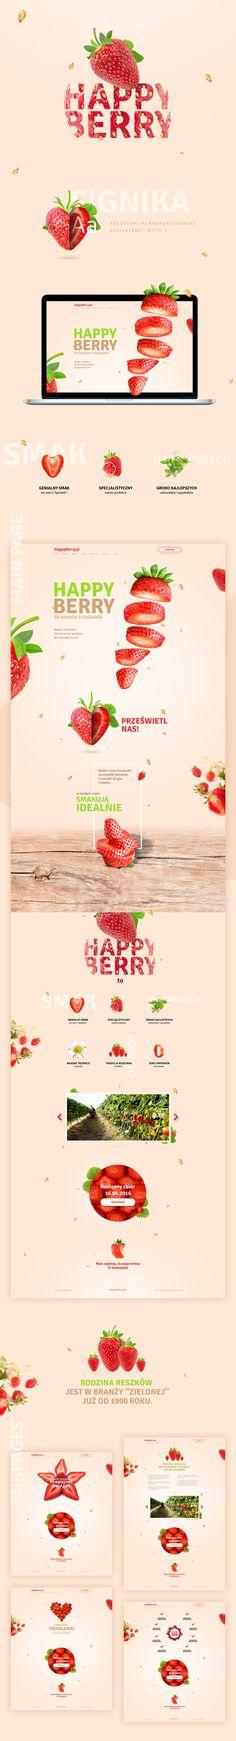 "Confira este projeto do @Behance: ""Strawberry Farm website concept"" https://www.behance.net/gallery/35392021/Strawberry-Farm-website-concept"